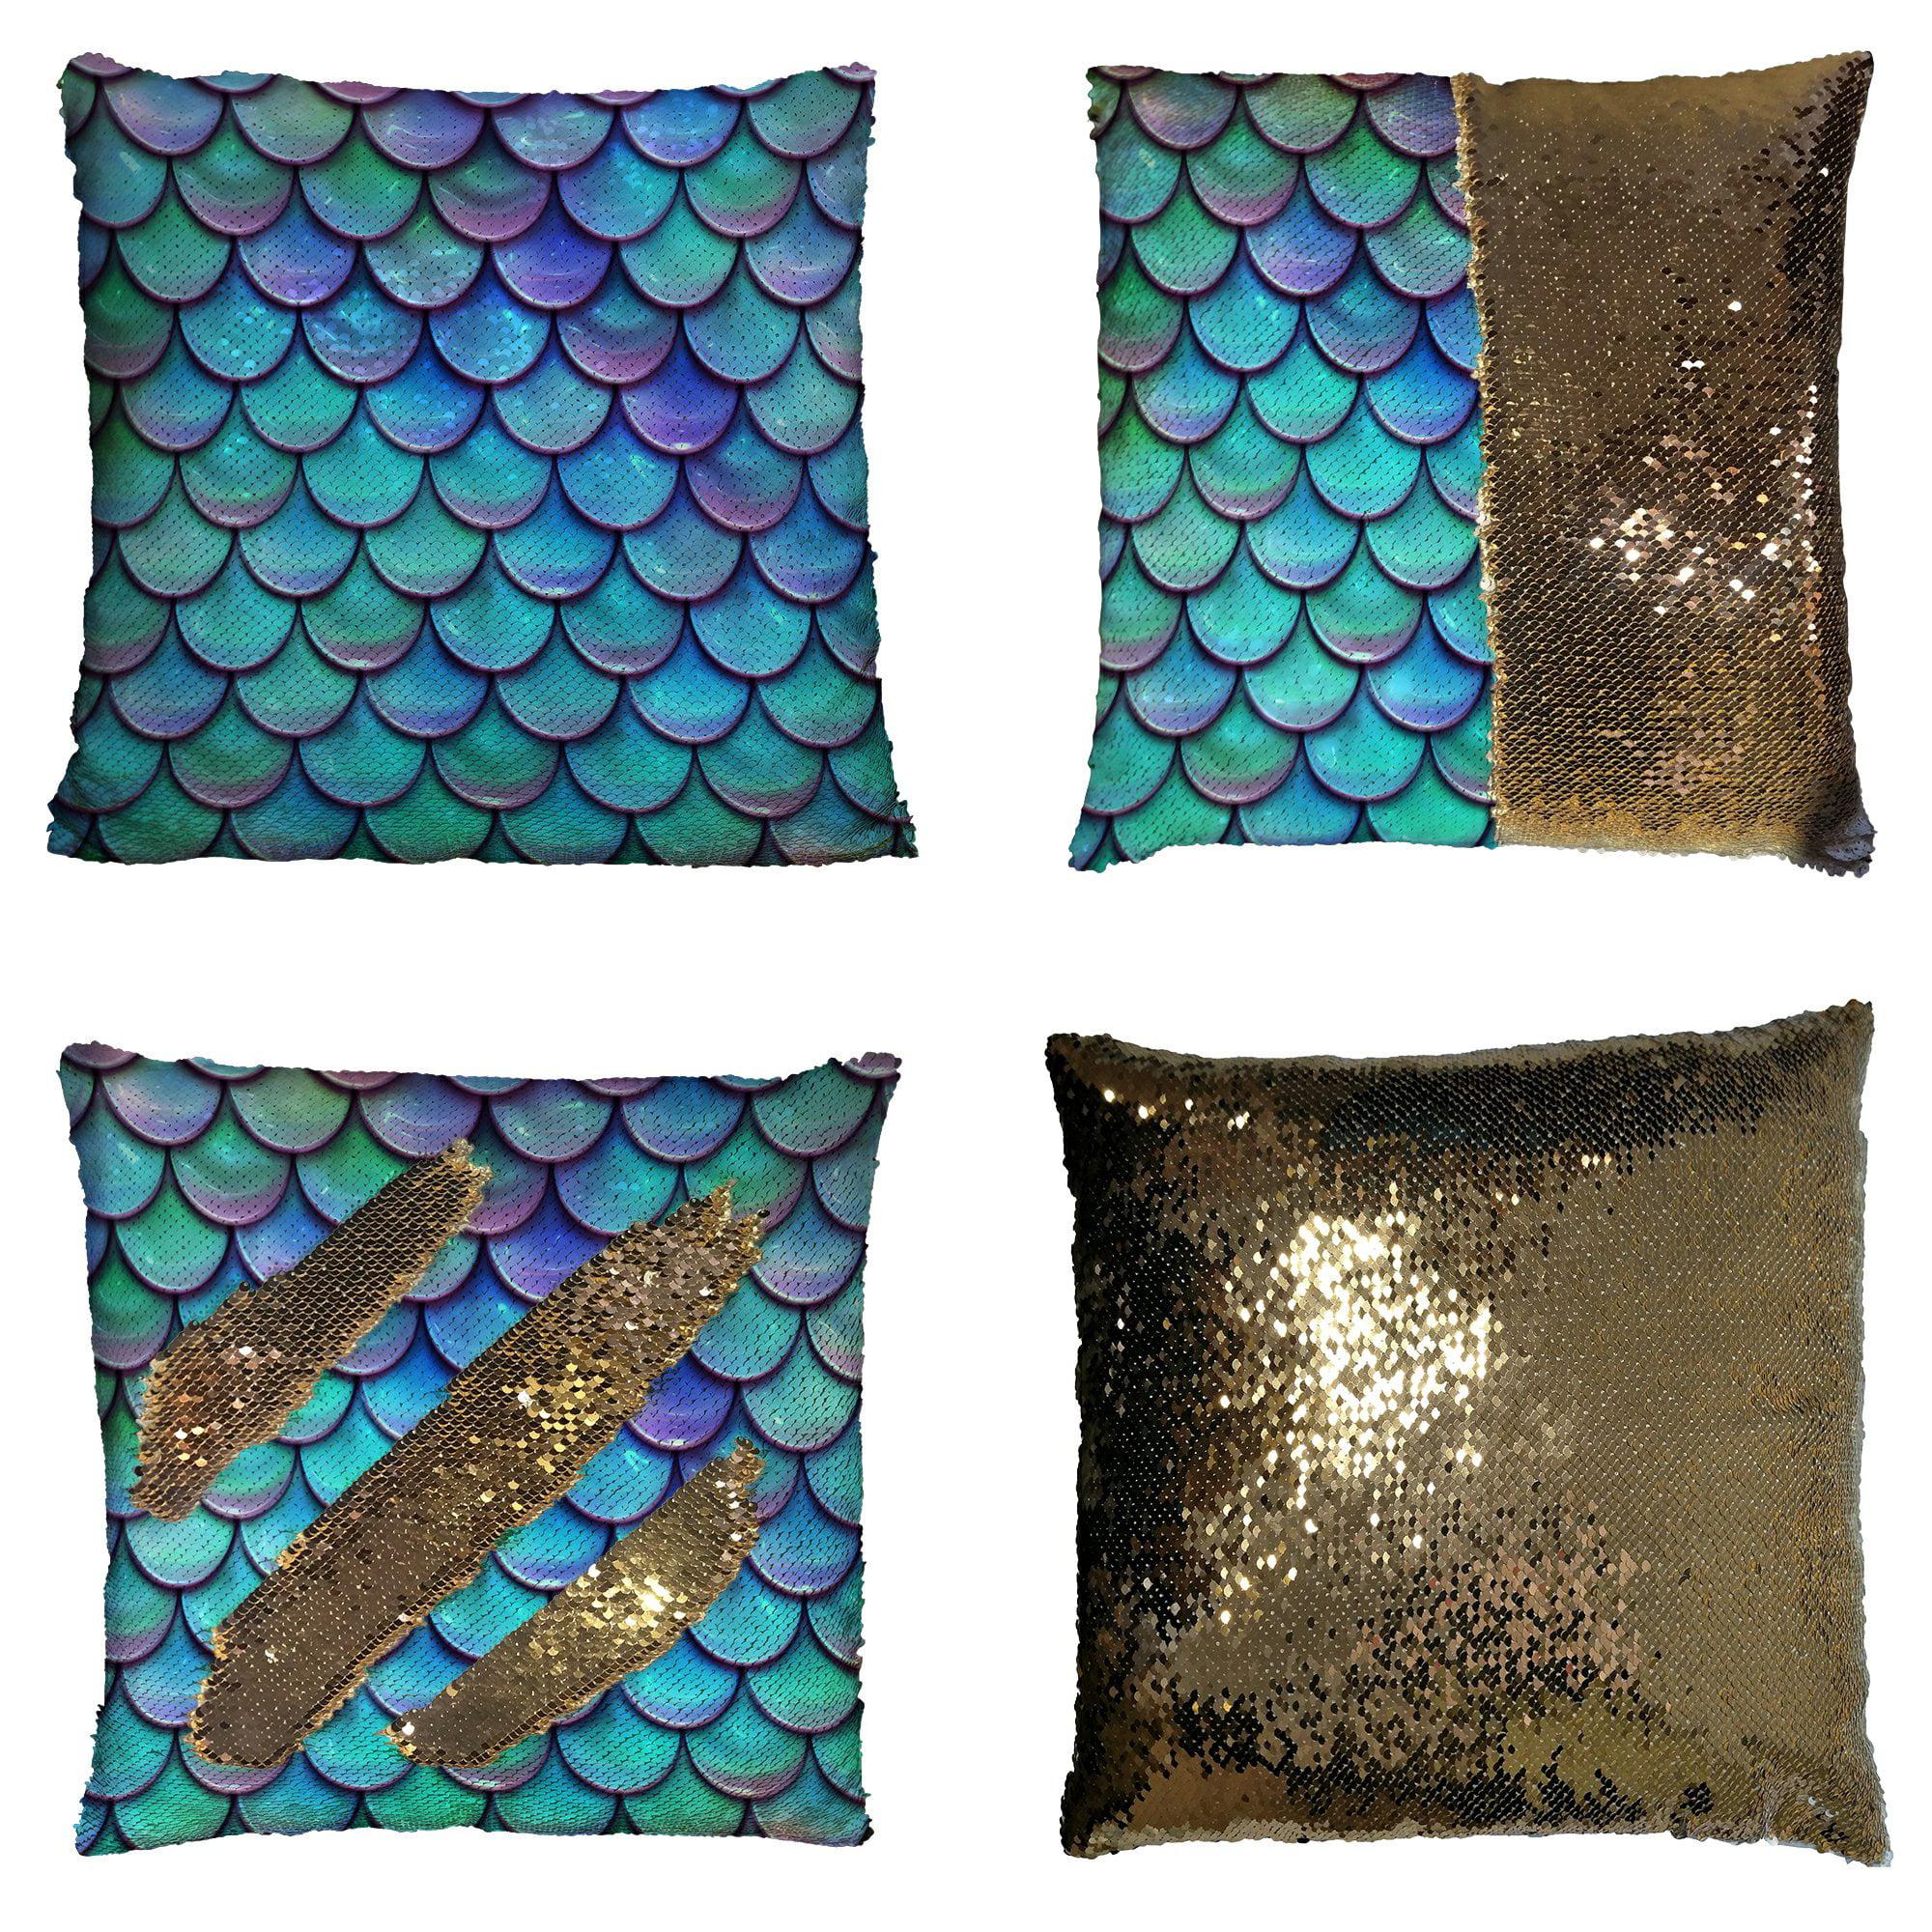 GCKG Fish Scales Purple Blue Reversible Mermaid Sequin Pillow Case Home Decor Cushion Cover 16x16 inches